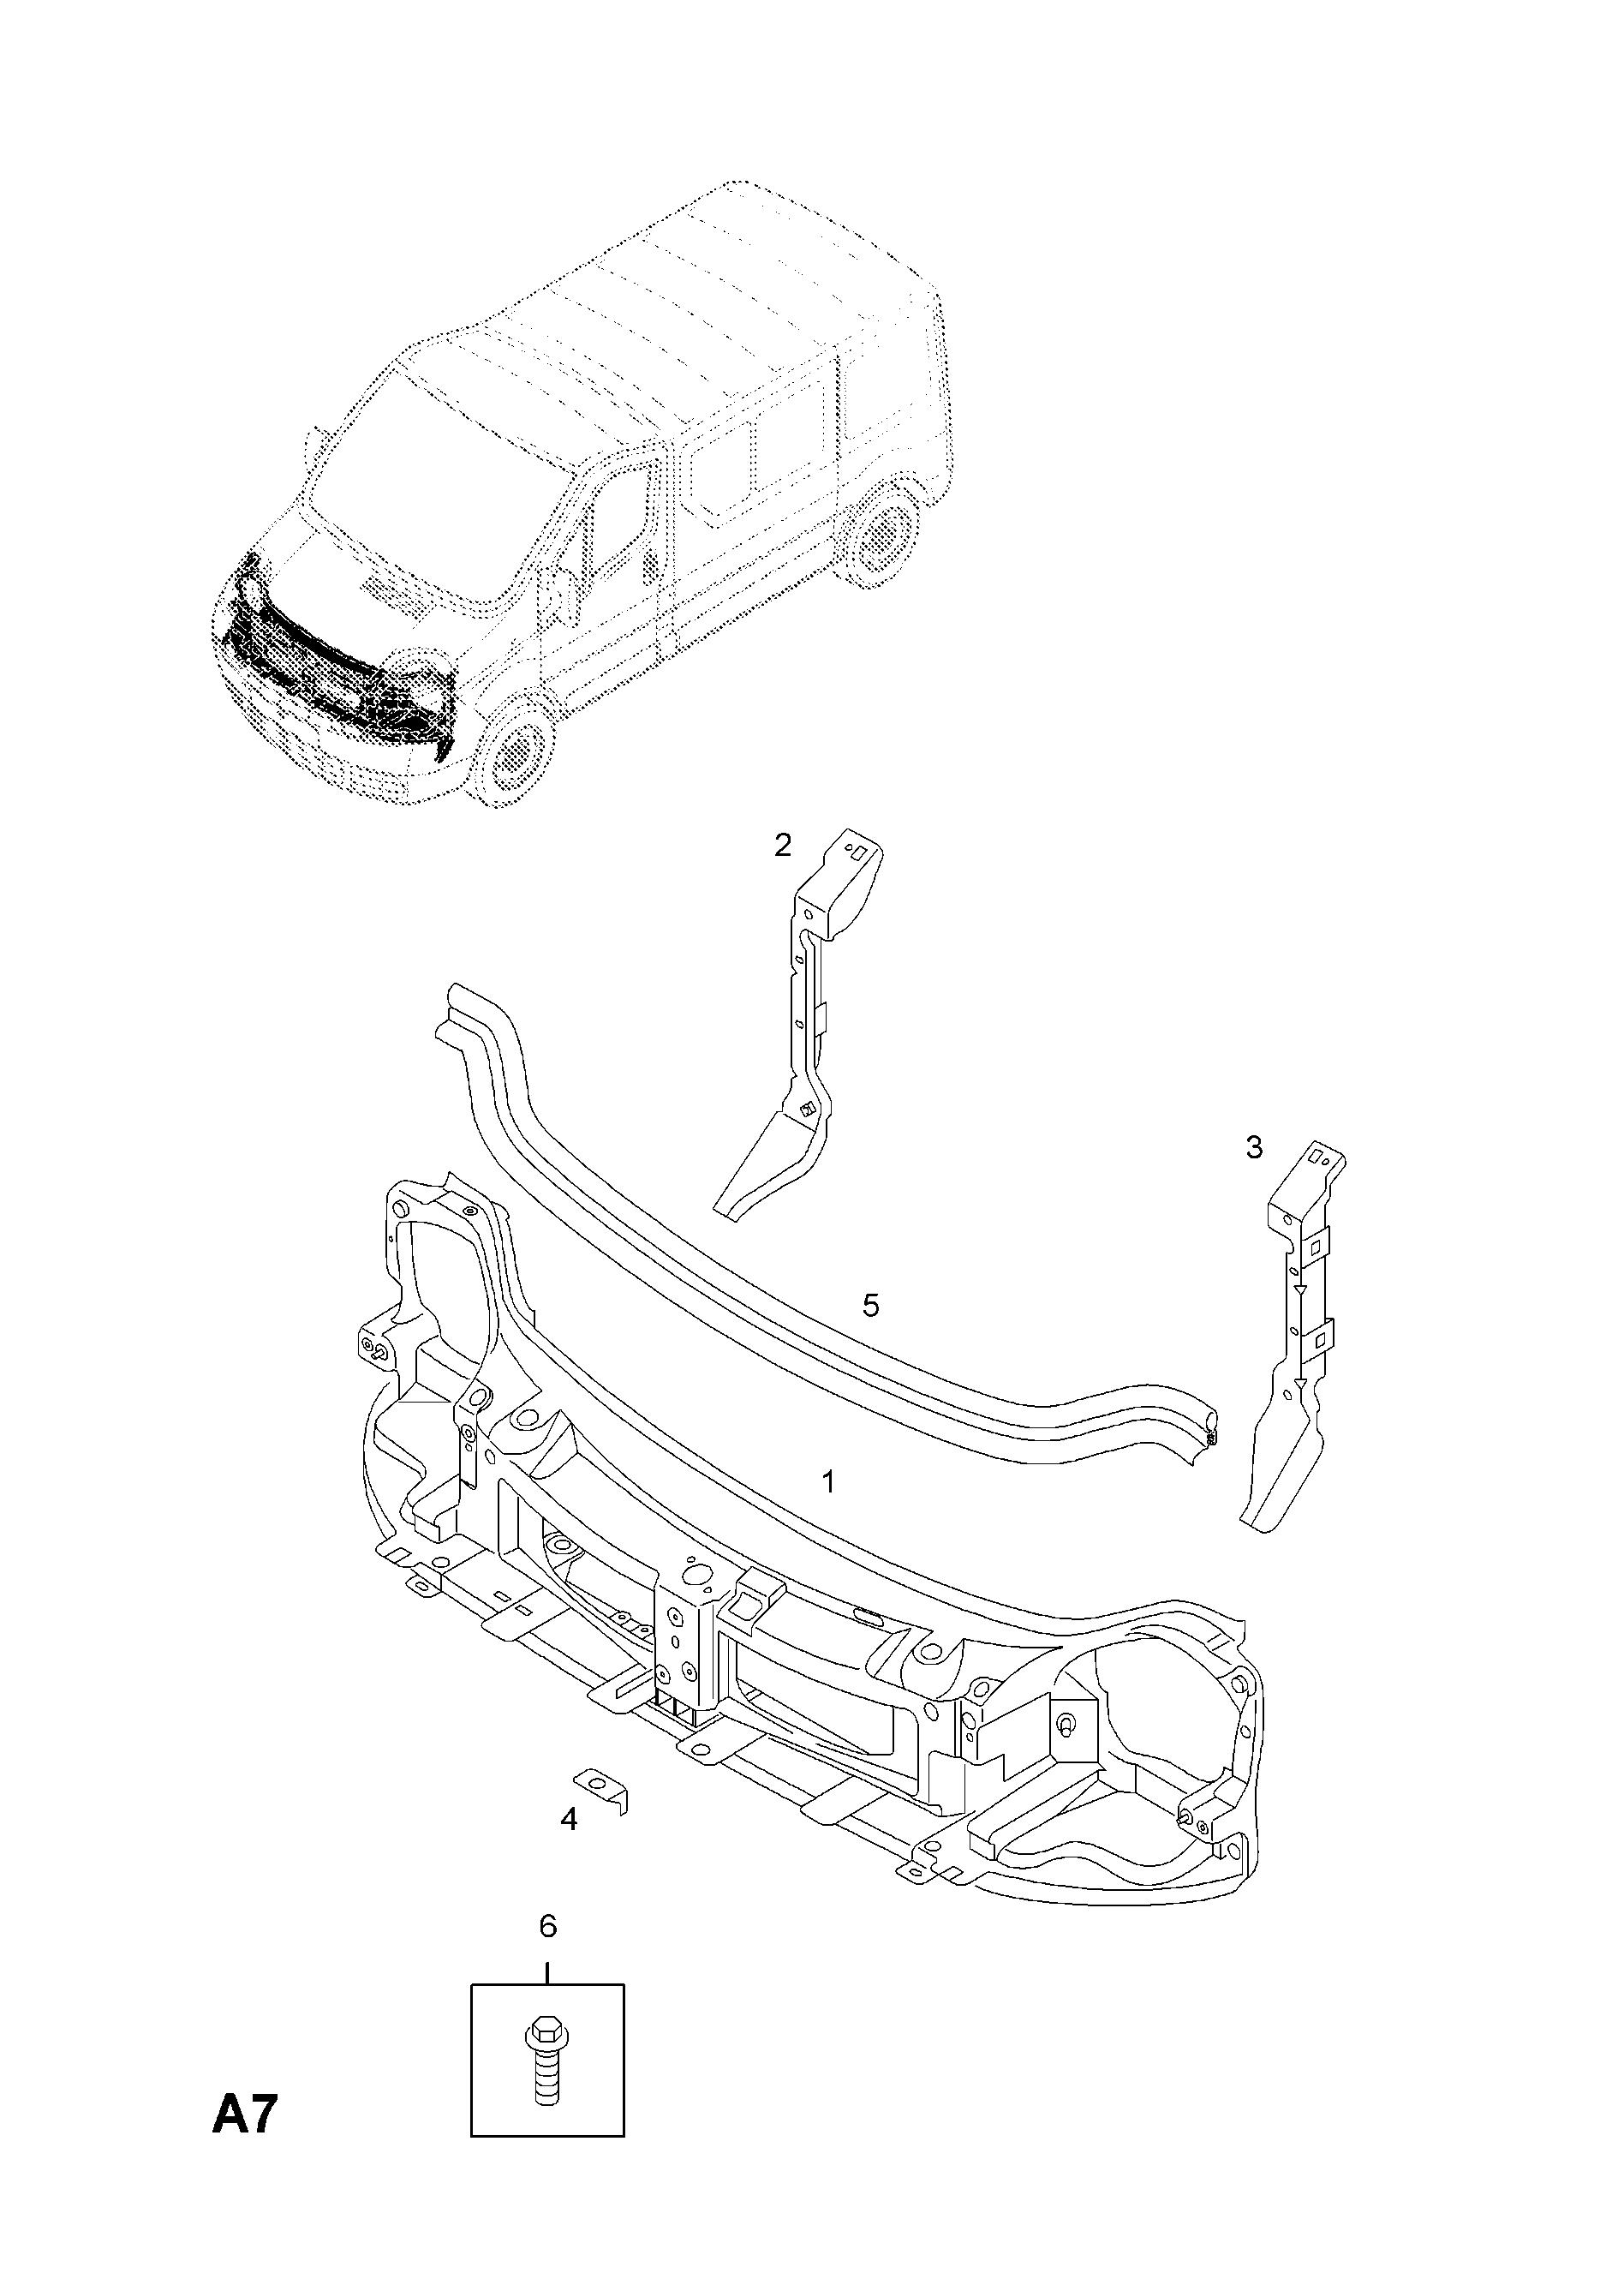 Vauxhall VIVARO-A ( 2001 - ), A BODY SHELL AND PANELS, 3